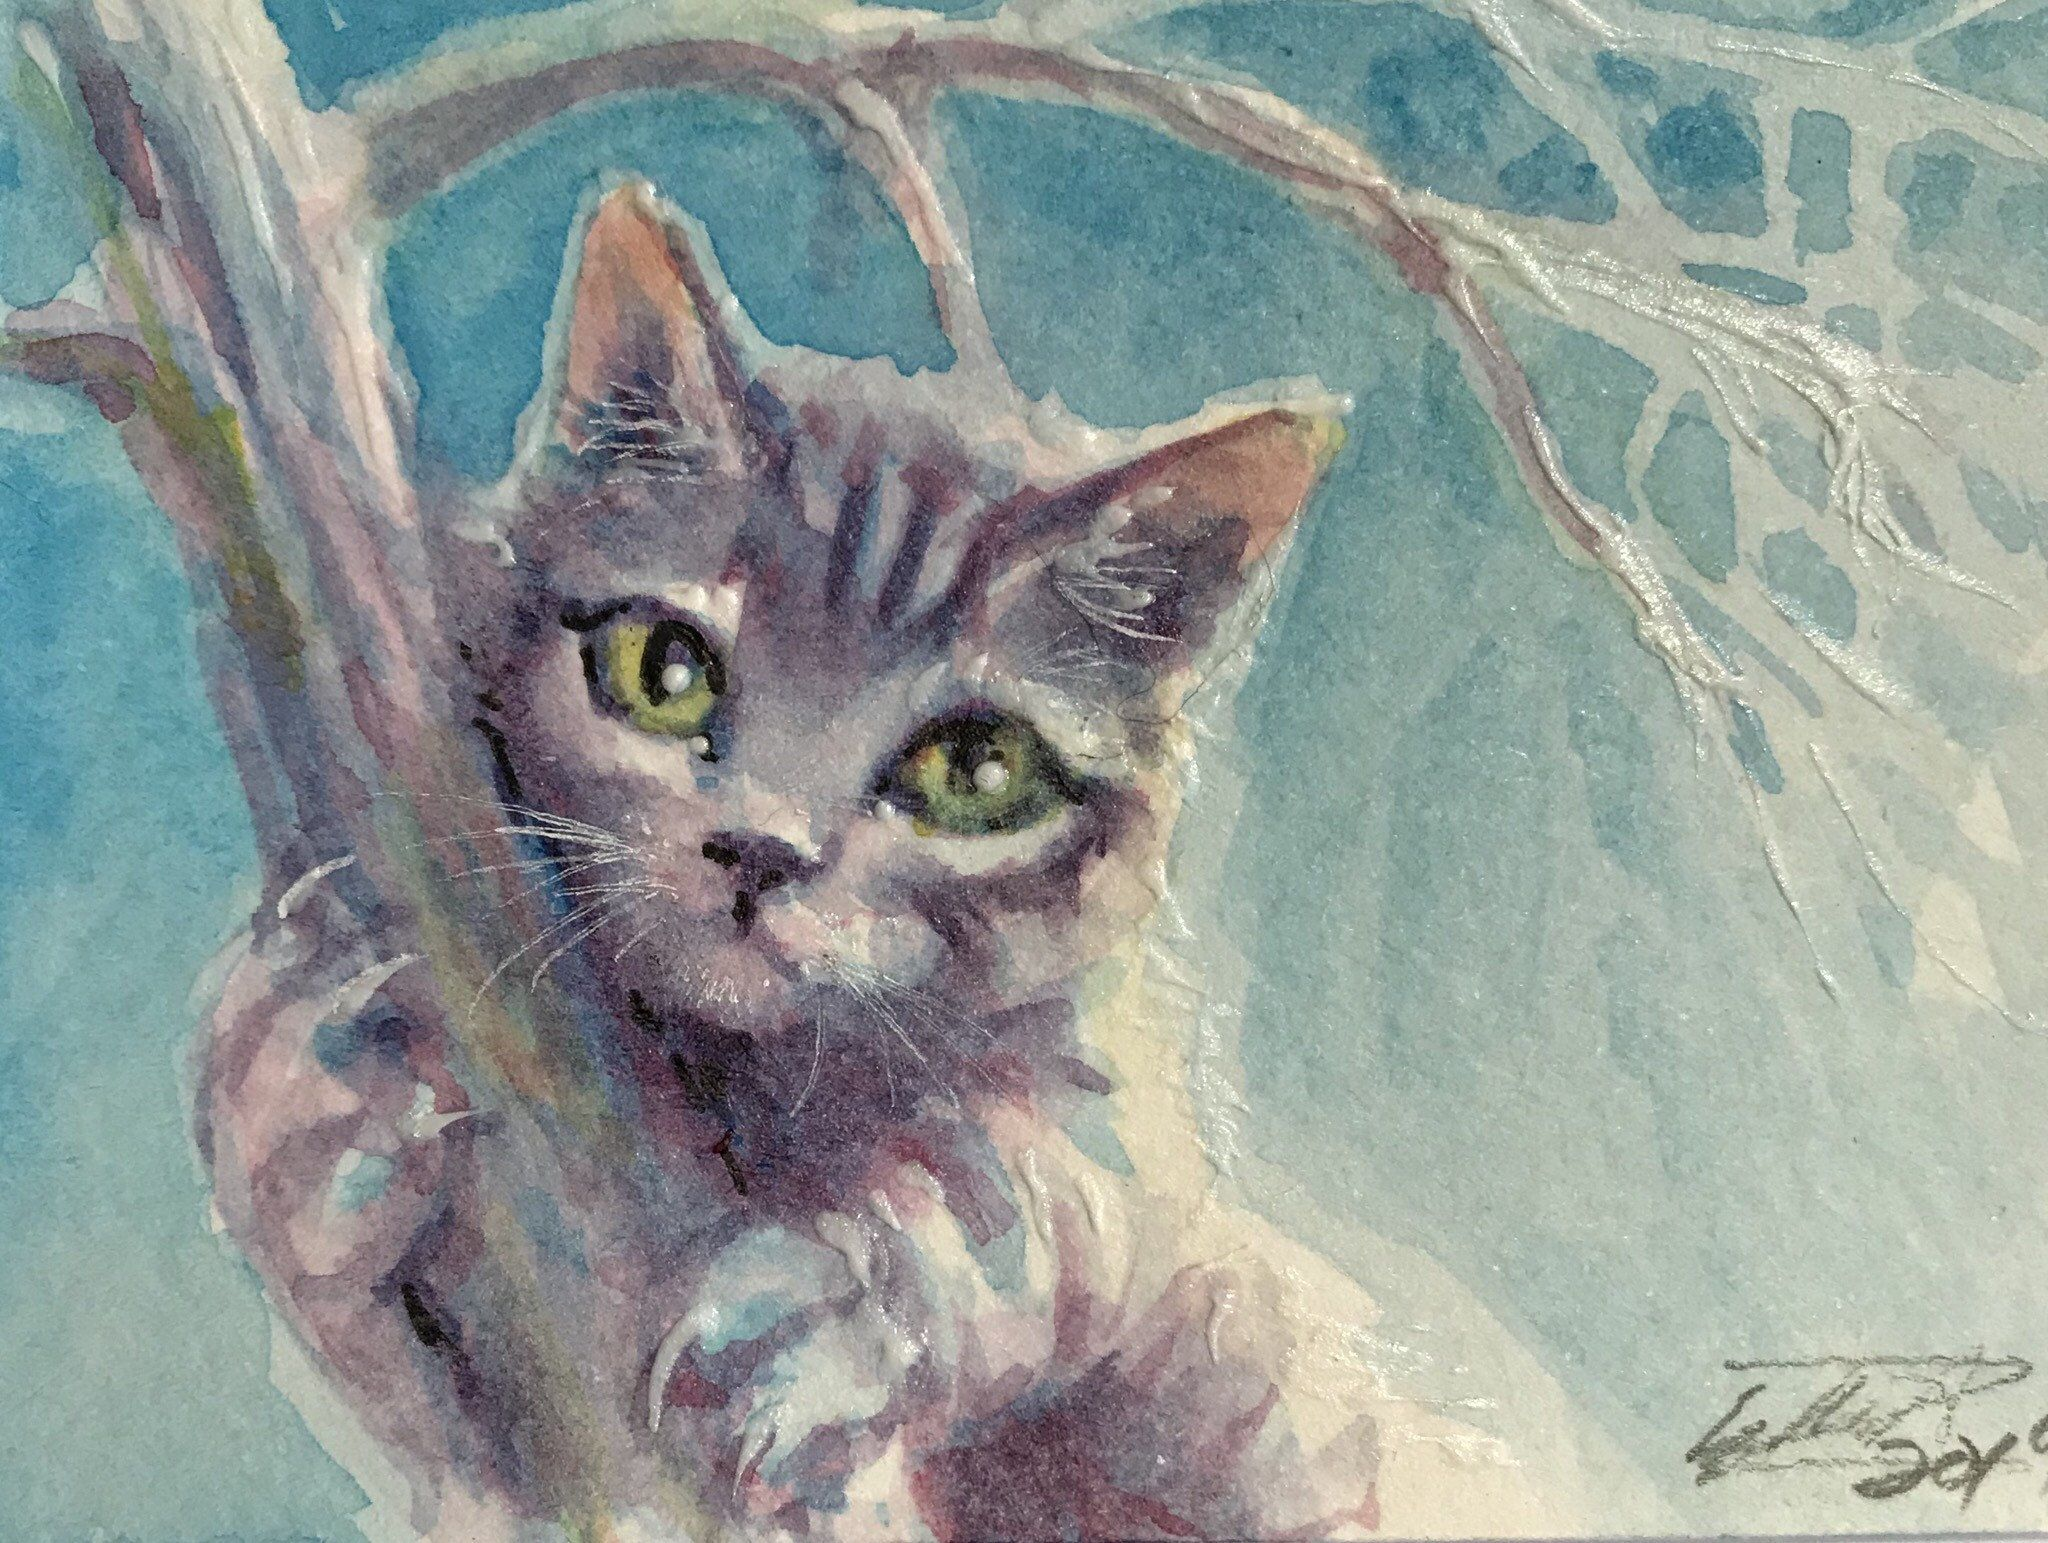 Aceo Original Painting Kitten Cat Artwork Cat In Tree Art Trading Card Pet Animal Paintings E A Eakin H Artettina A Animal Paintings Cat Painting Cat Artwork